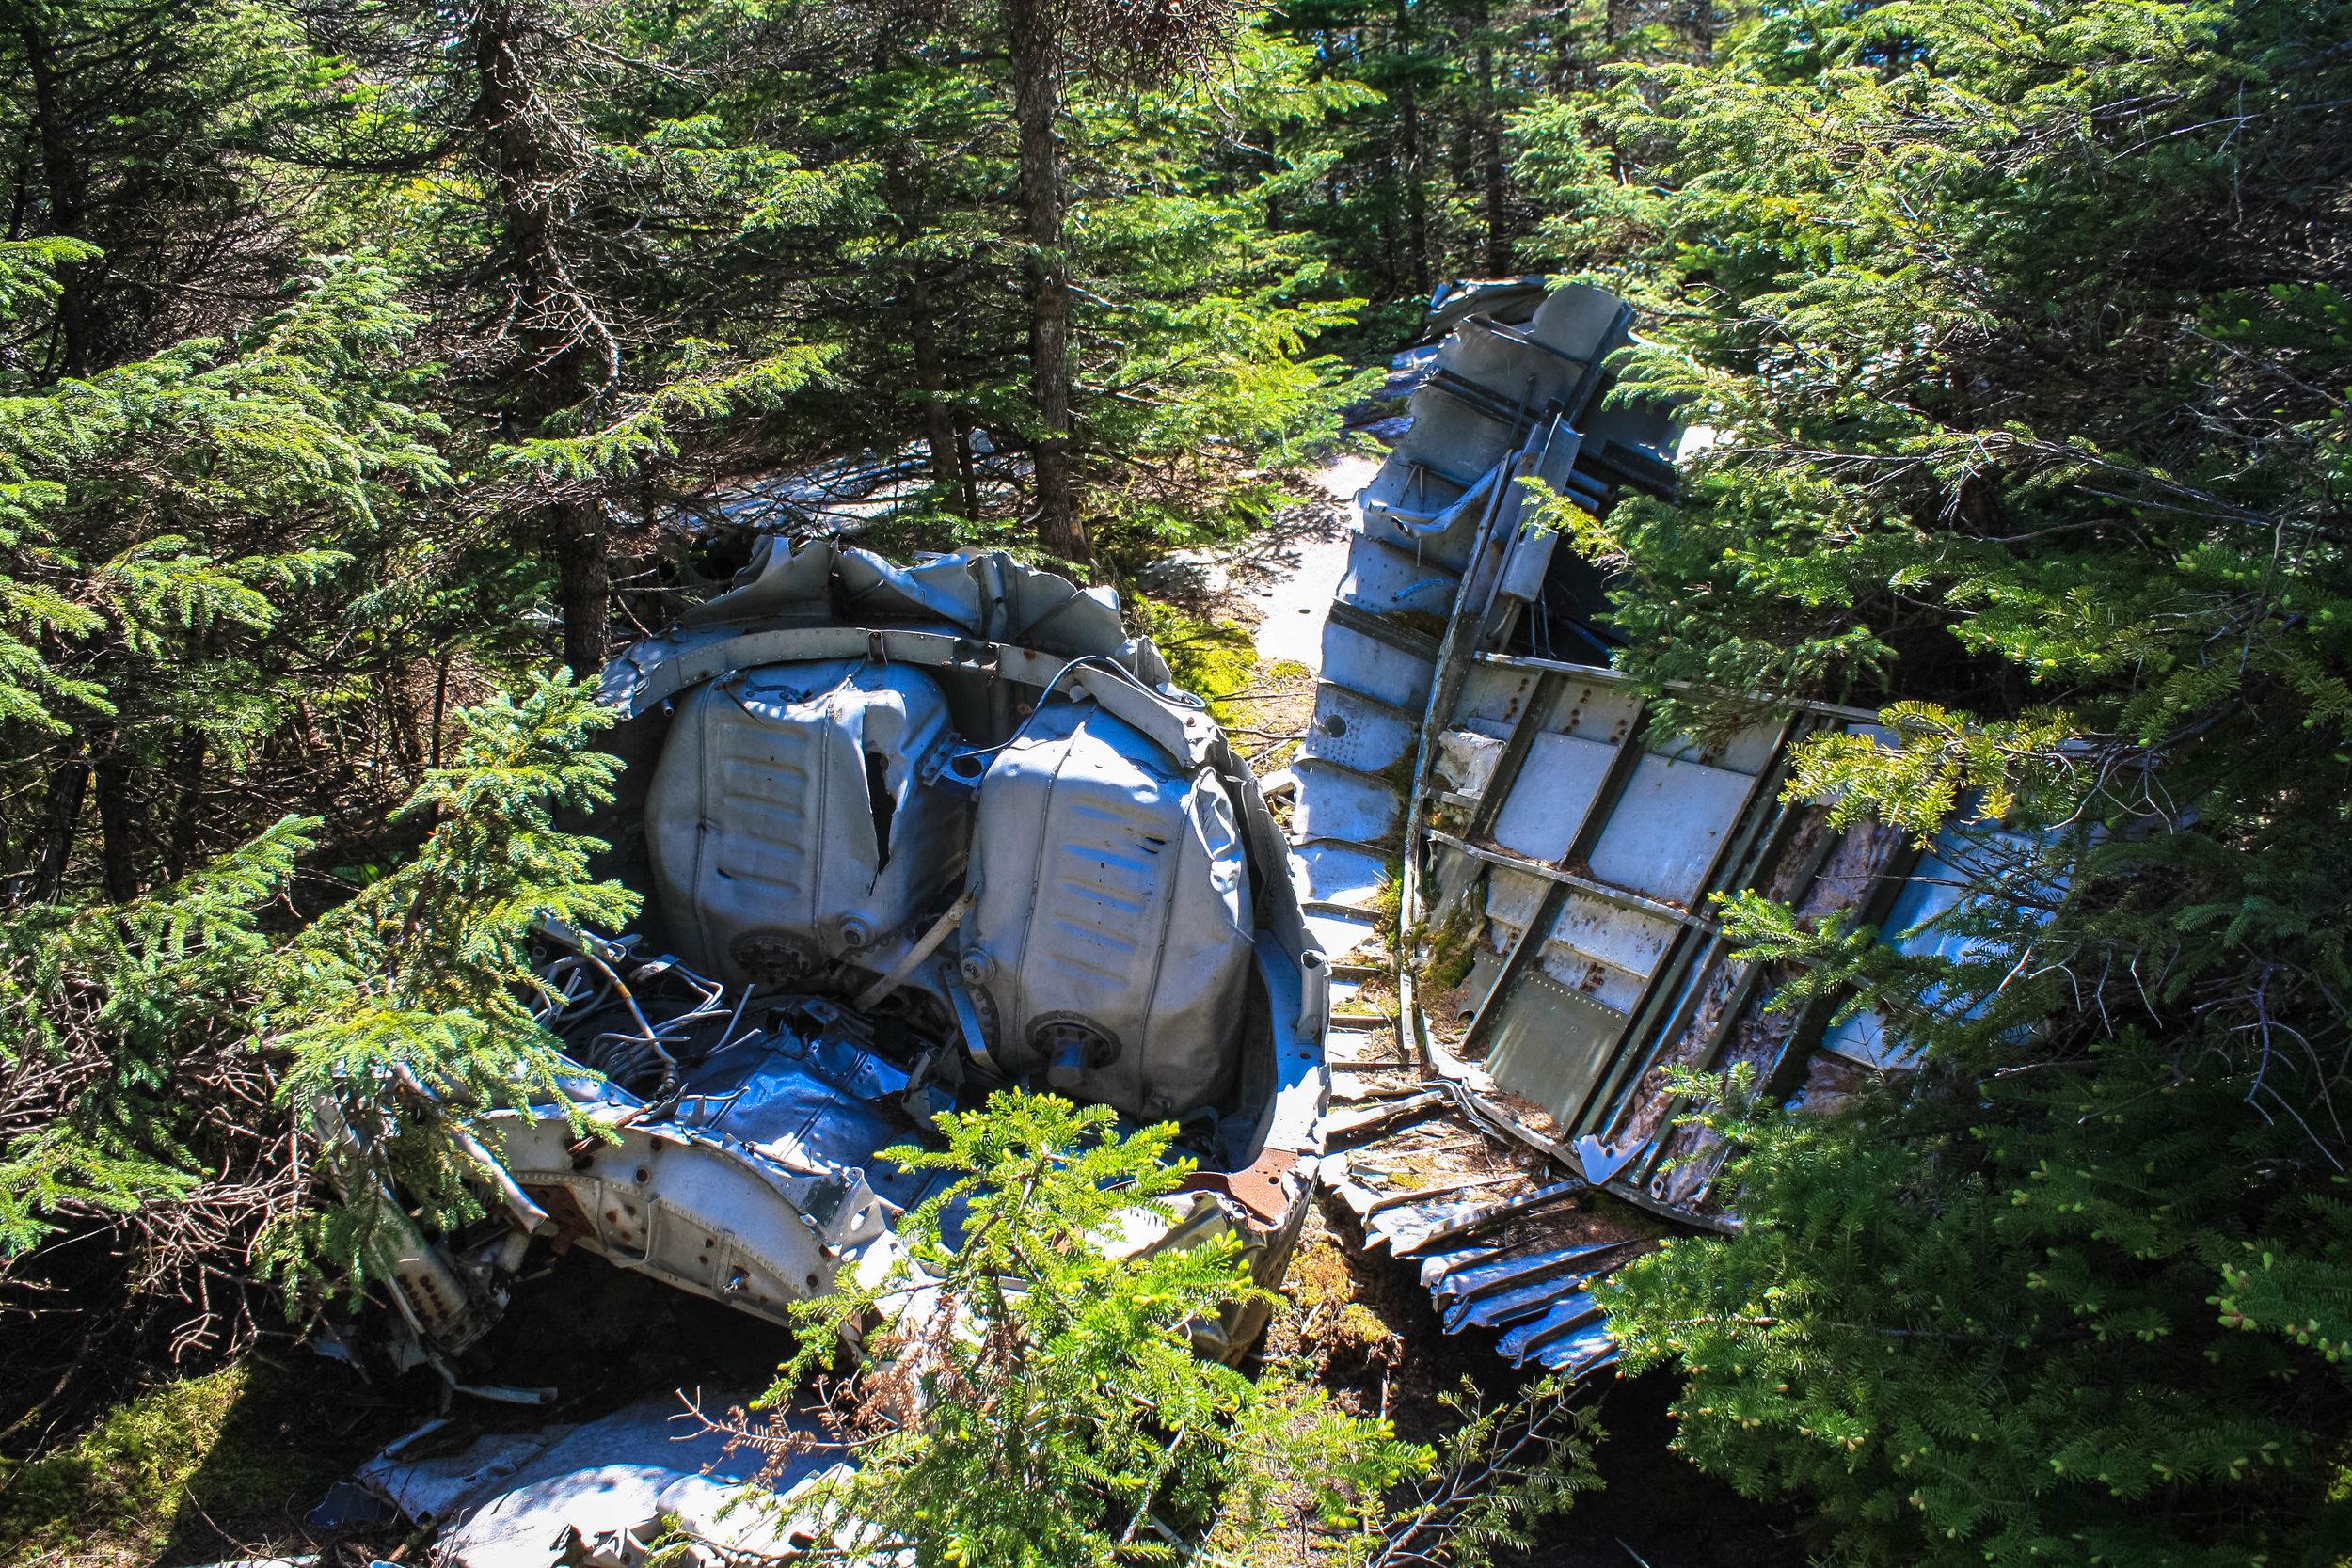 Plane Wreckage 2 Mount Success.jpg